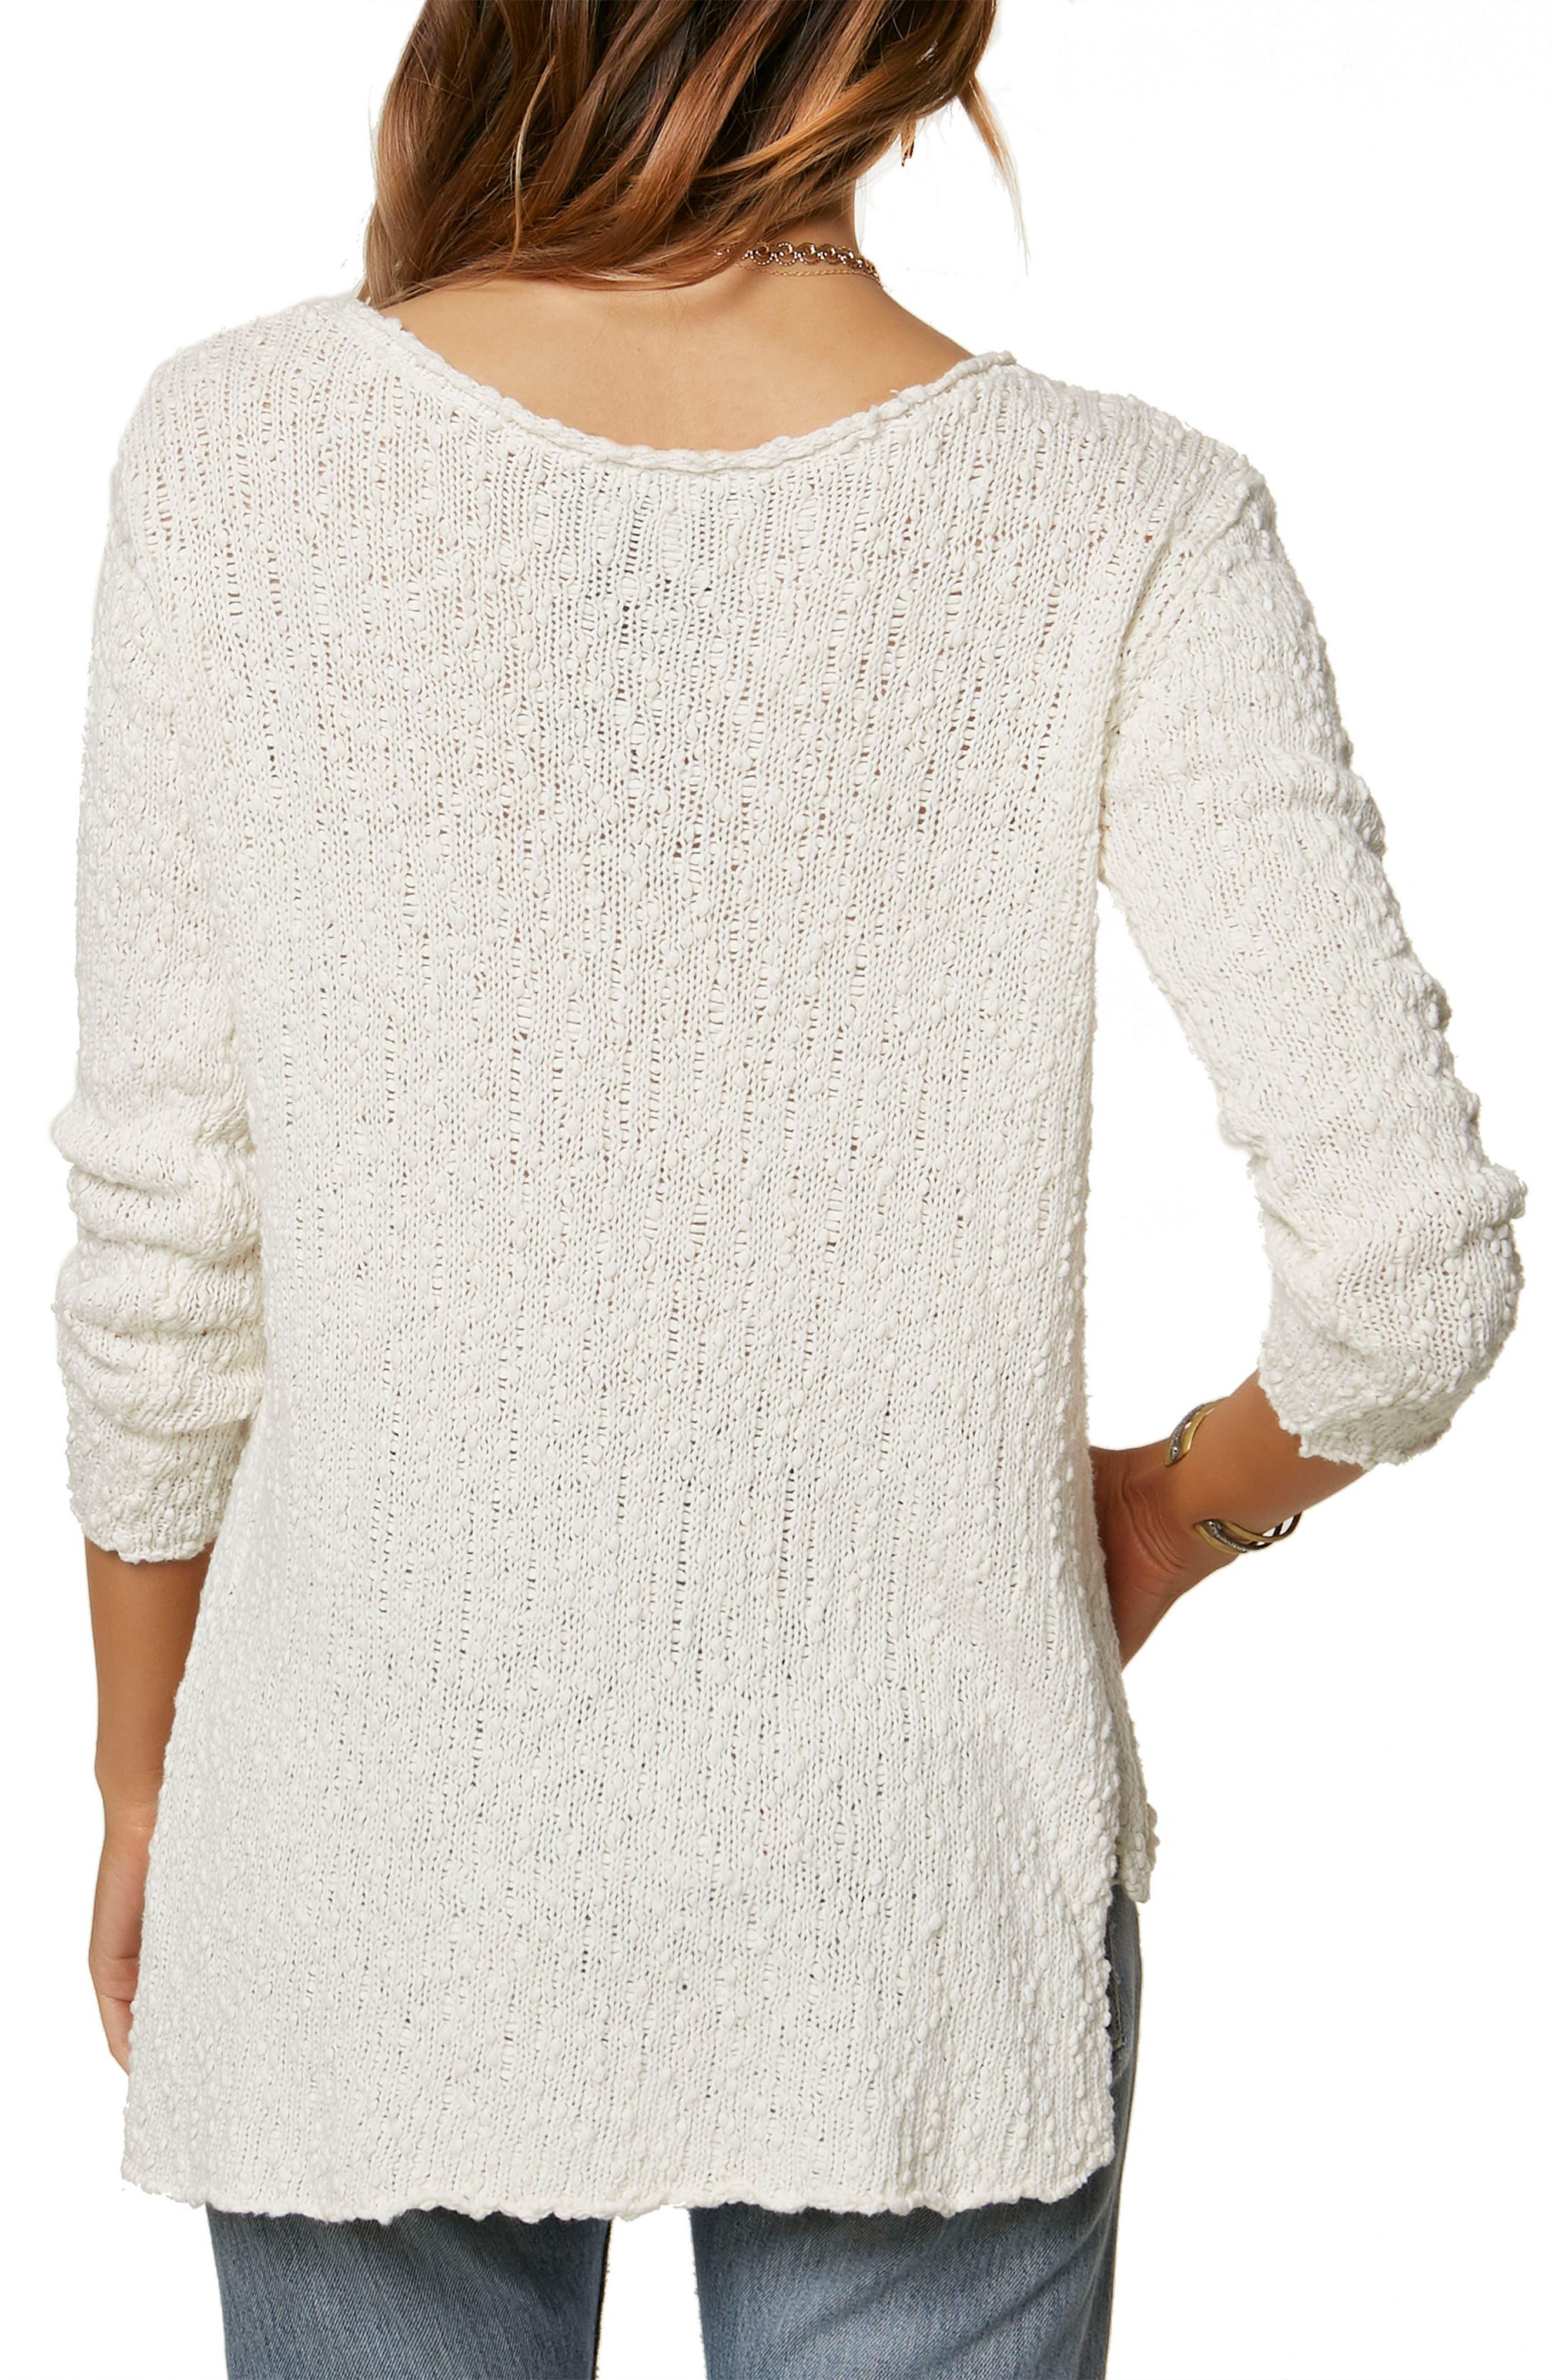 Rocha Pullover Sweater,                             Alternate thumbnail 2, color,